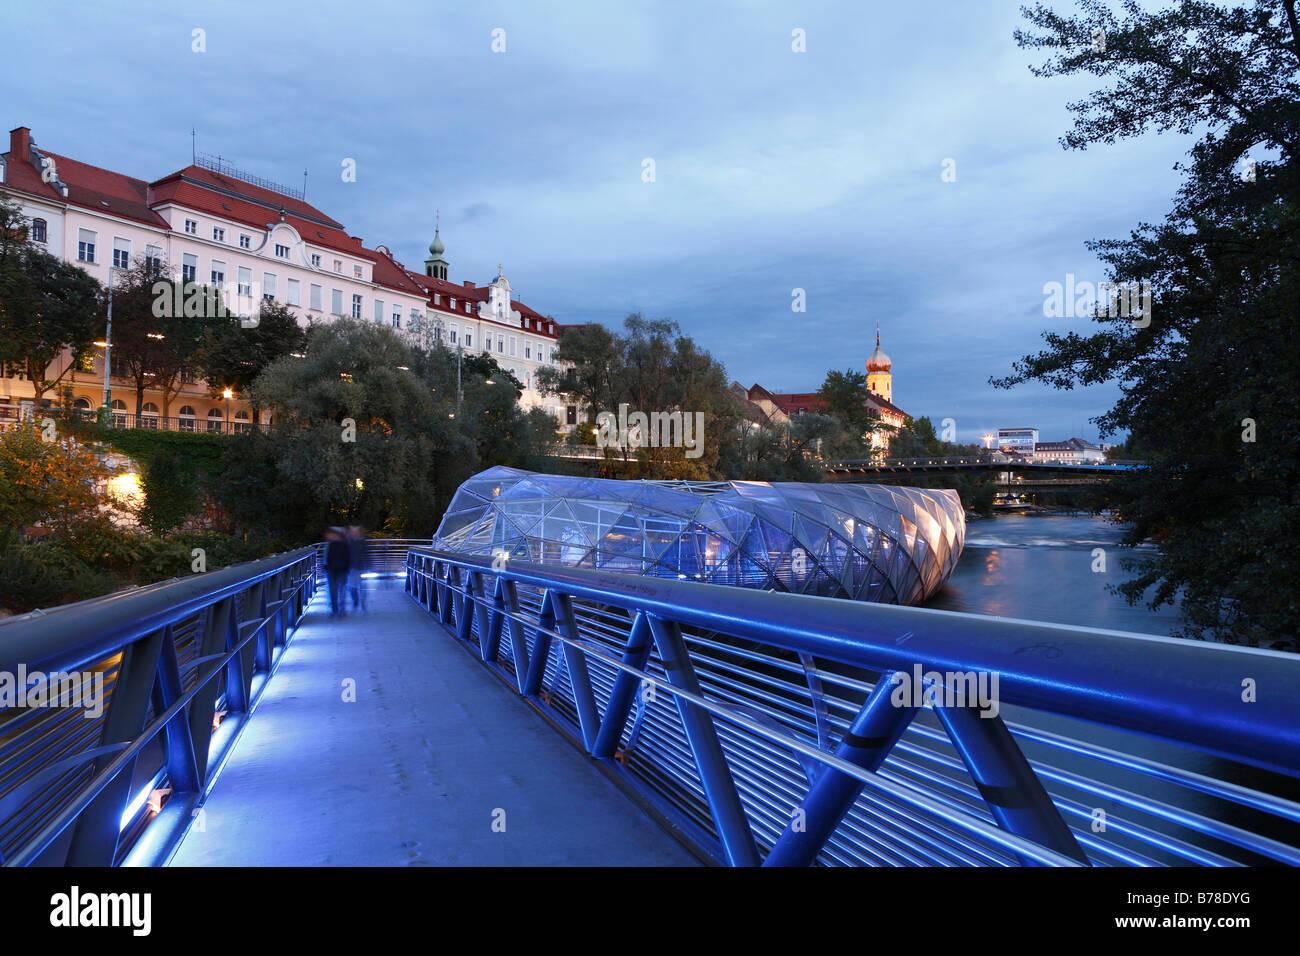 Murinsel, Mur Island on Mur River, Graz, Styria, Austria, Europe - Stock Image